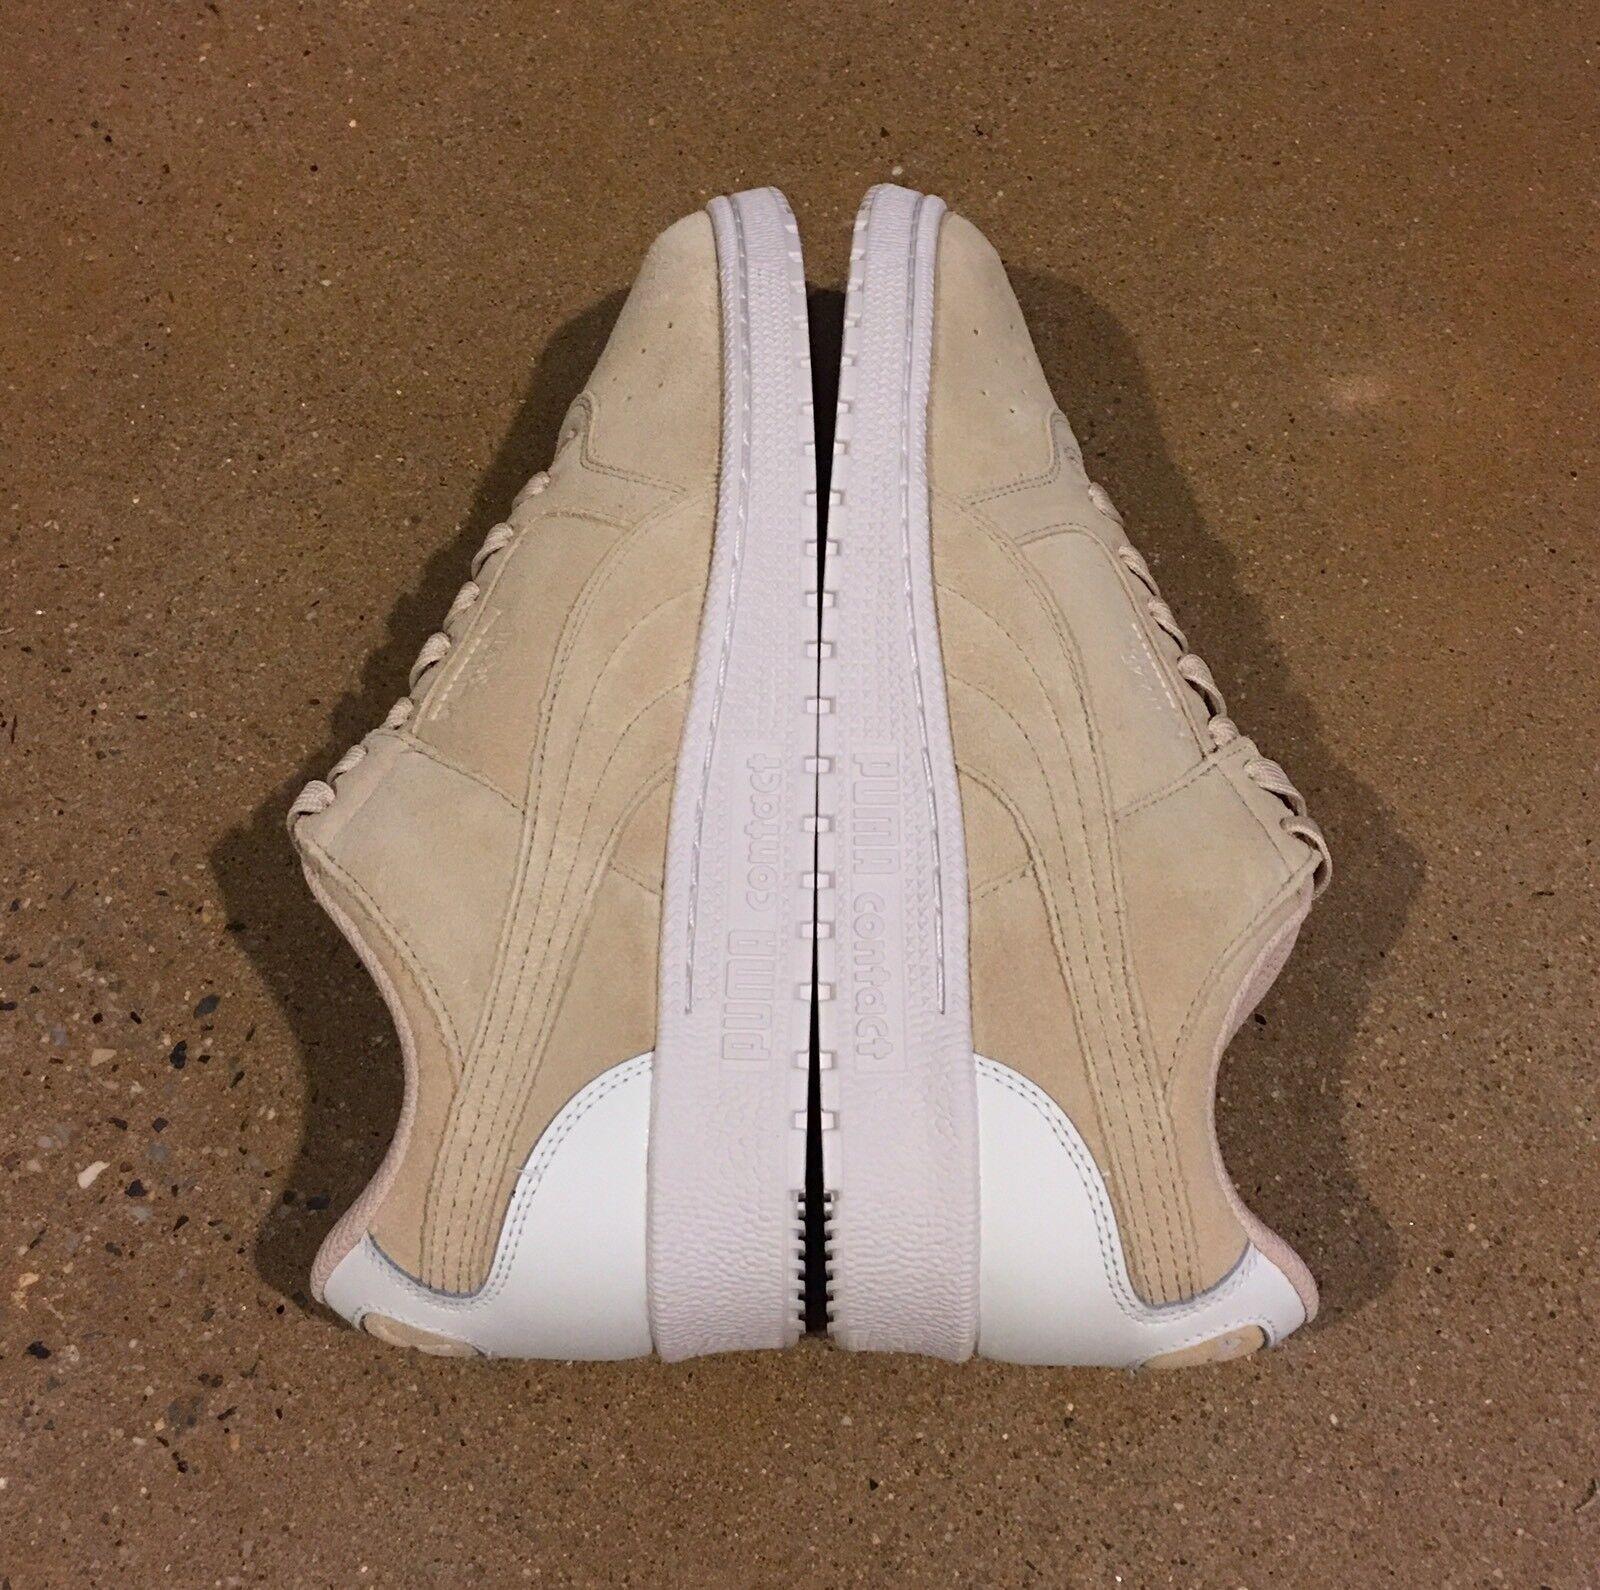 Puma Sky II Lo Size 10 US Natural Vachetta Basketball Trainers Shoes Scarpe da Ginnastica